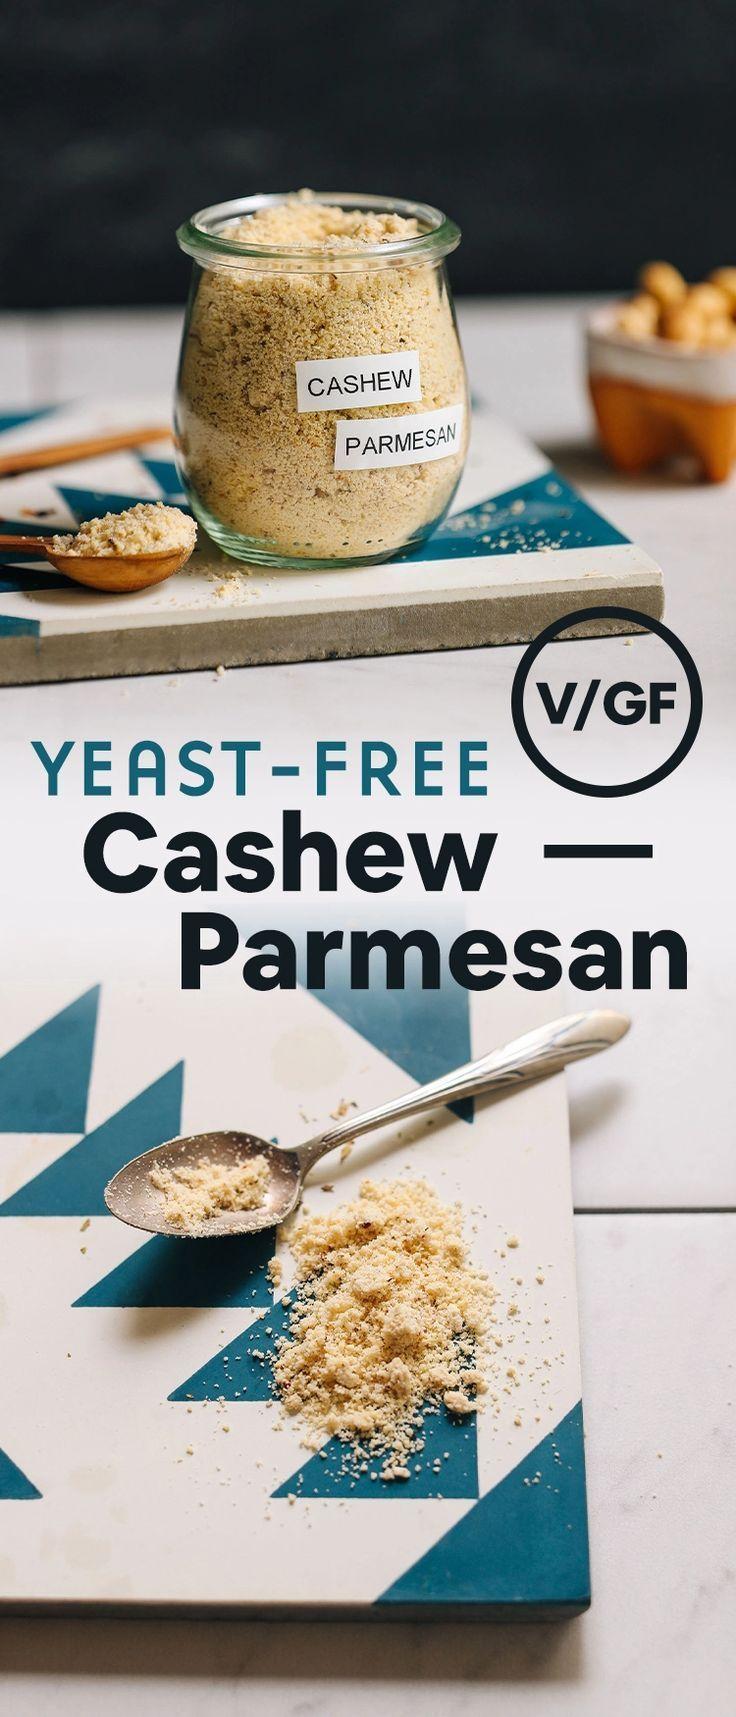 Yeast Free Cashew Parmesan 5 Minutes Minimalist Baker Recipes Recipe Recipes Vegan Cheese Baker Recipes